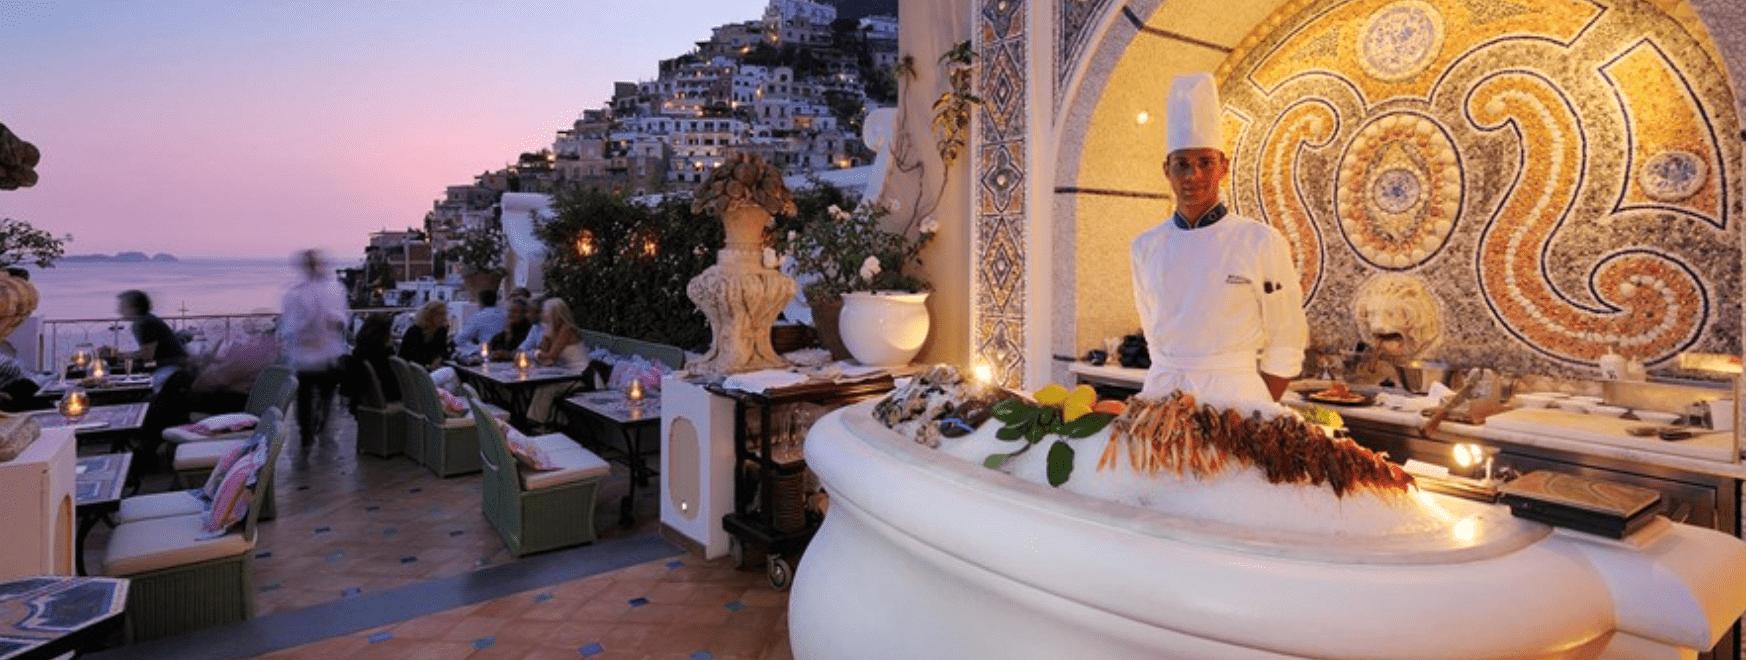 sireneuse michelin star amalfi travel guide min - Valef Yachts Chartering